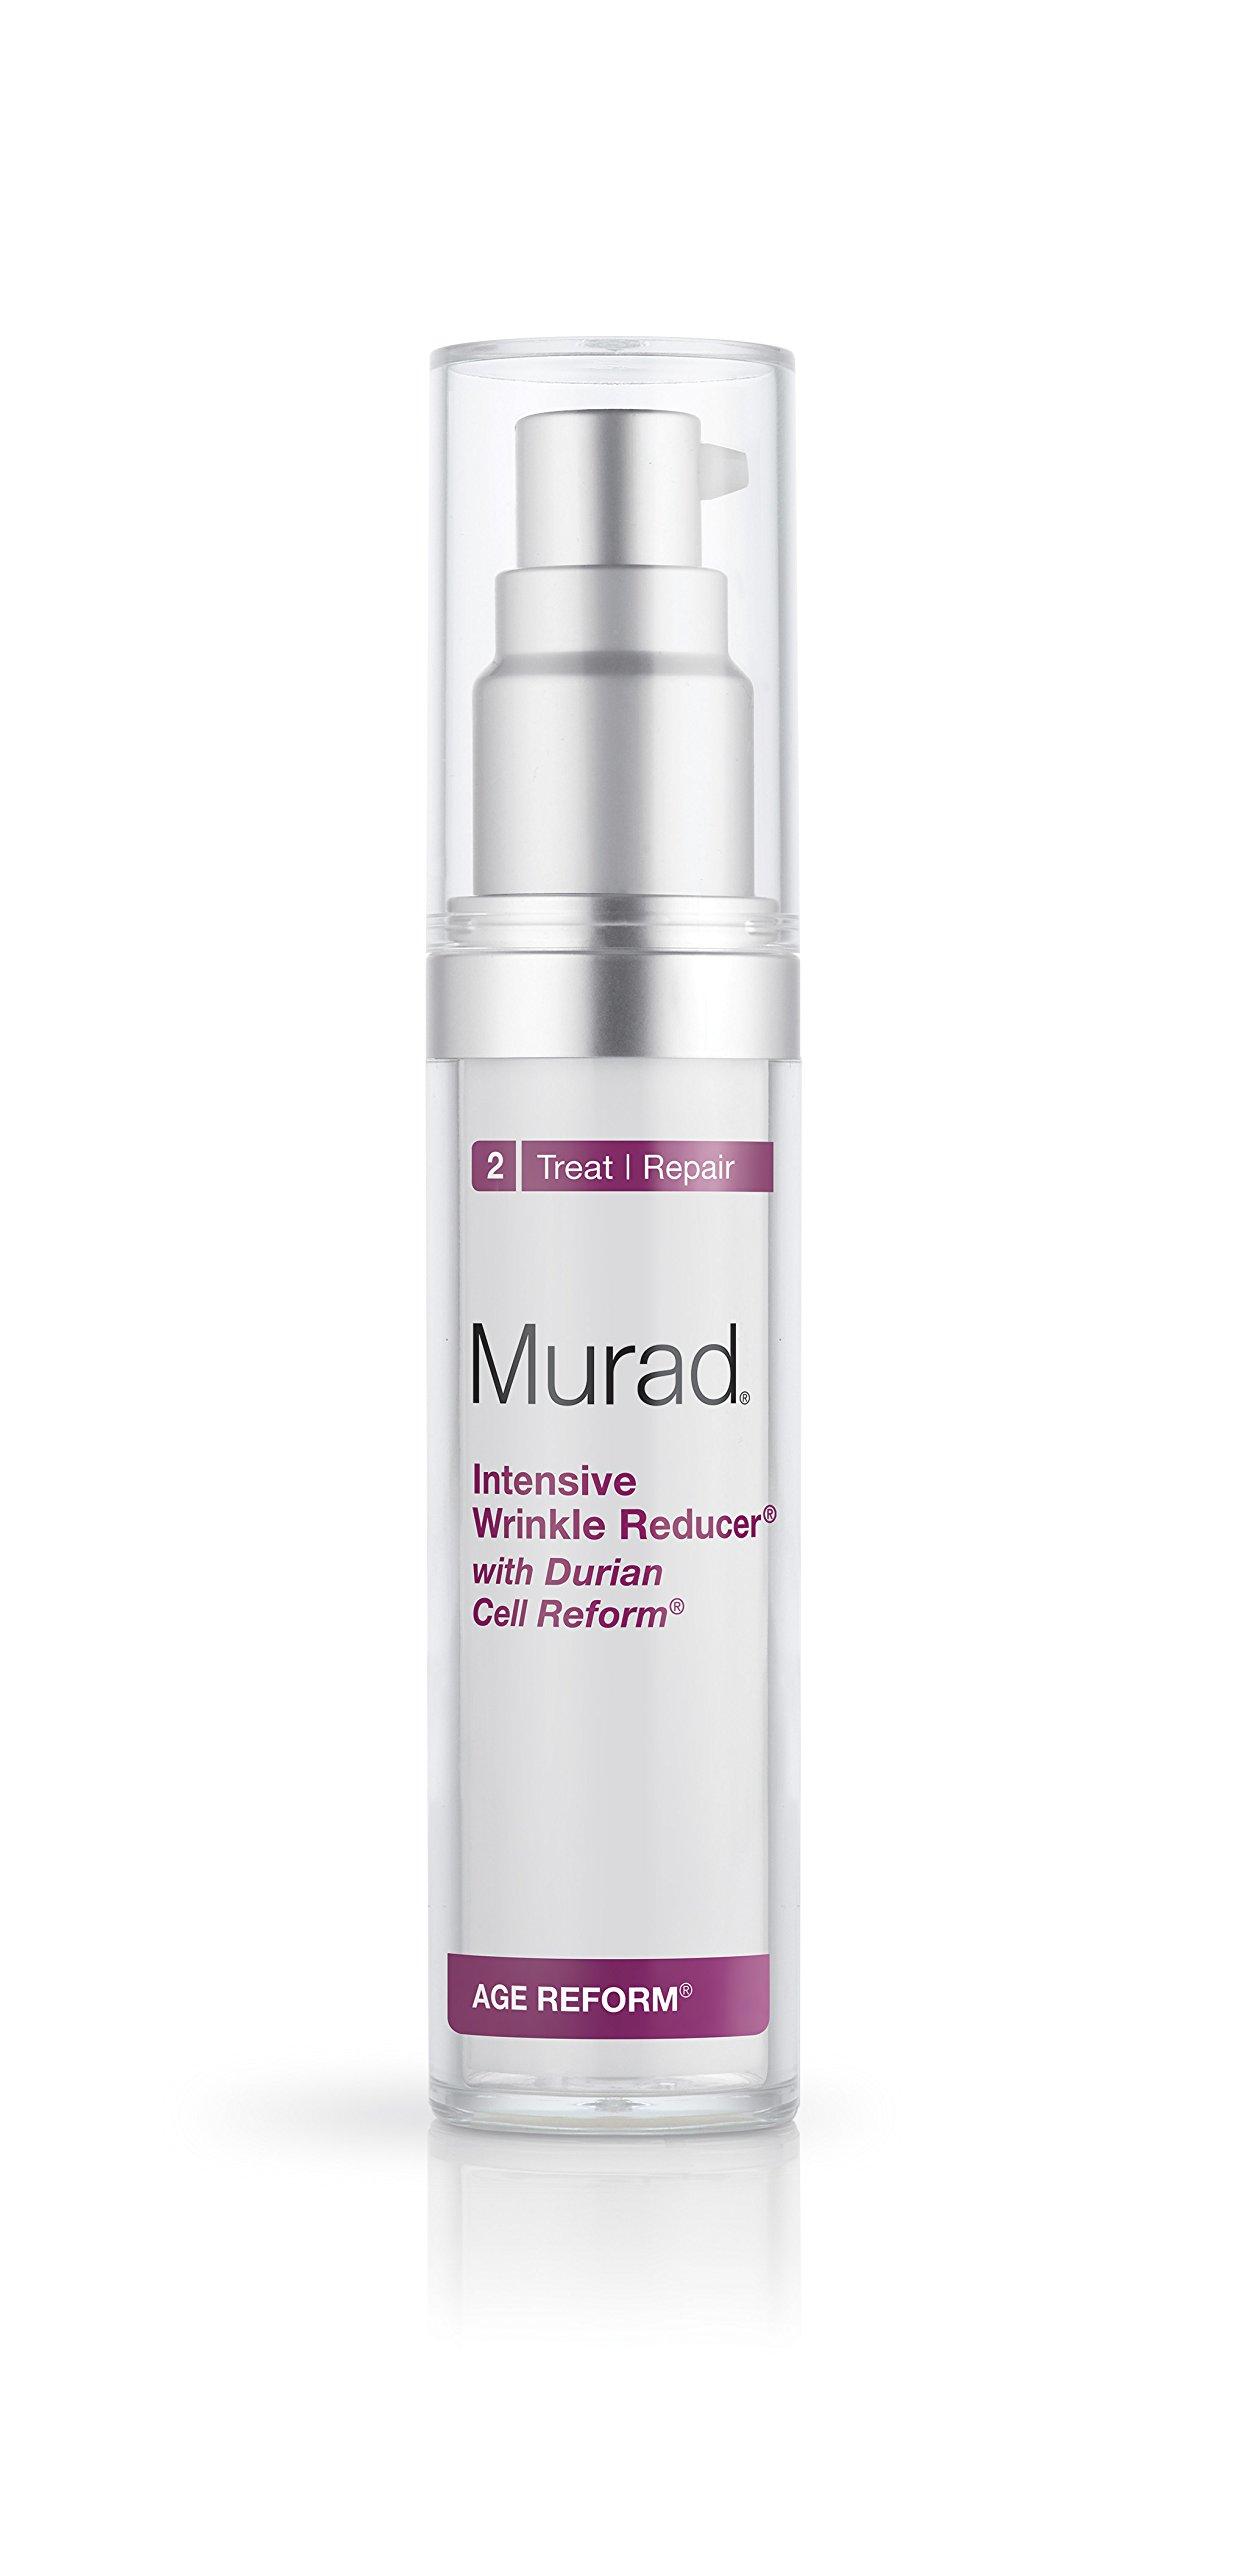 Murad Intensive Wrinkle Reducer, 1.0 oz.